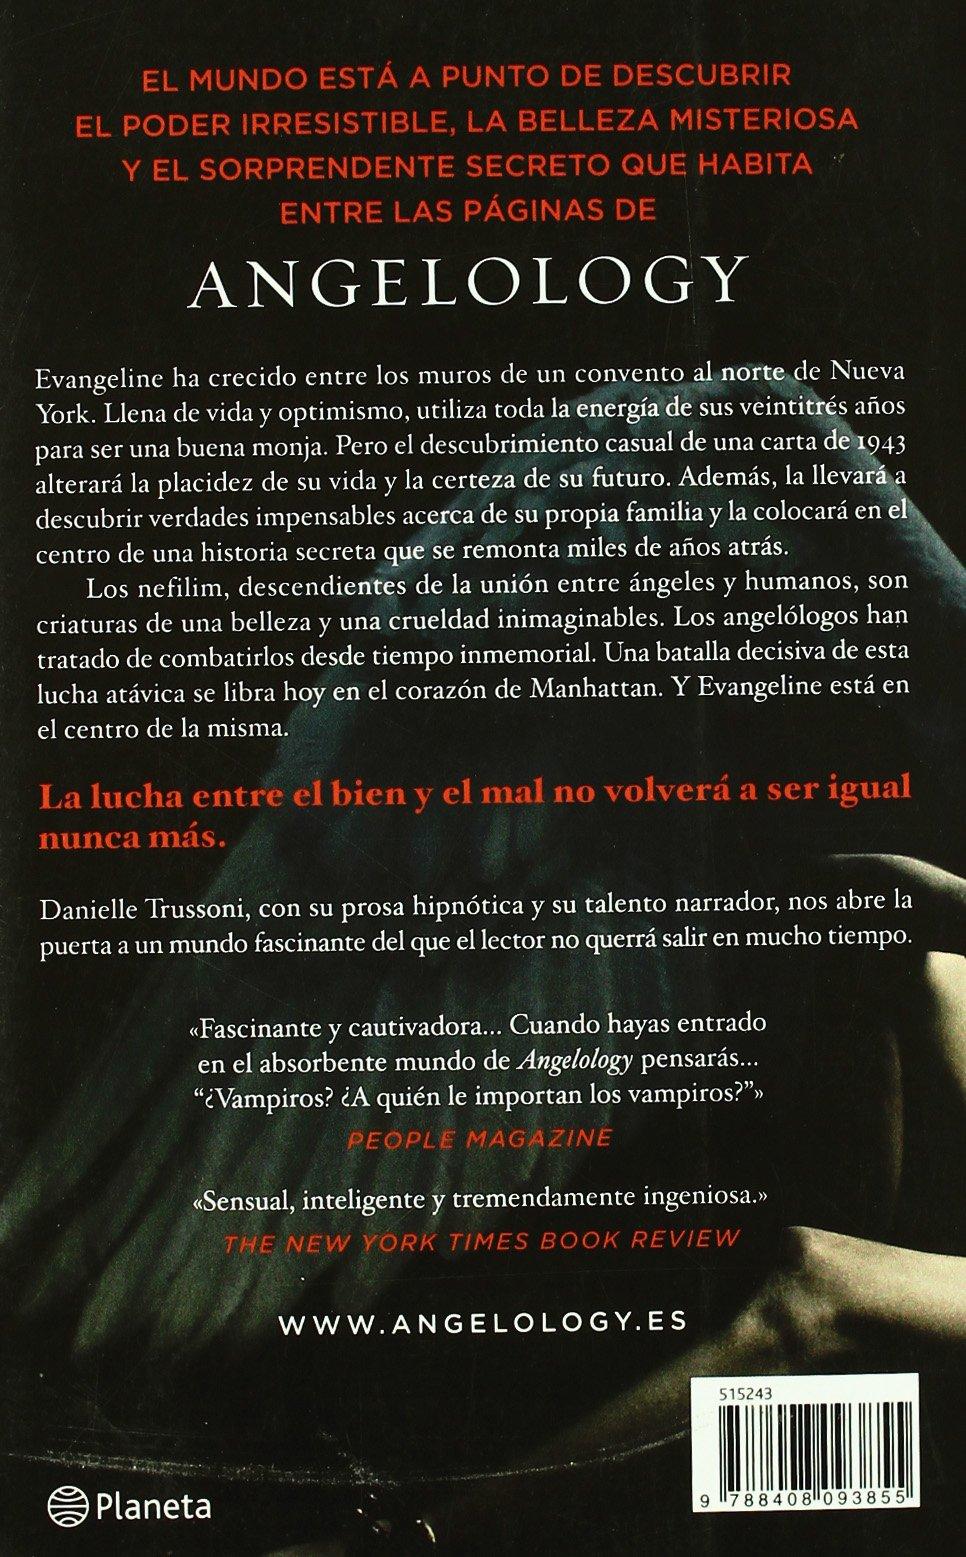 Angelology El Libro De Las Generaciones Spanish Edition Danielle Trussoni 9788408093855 Amazon Books